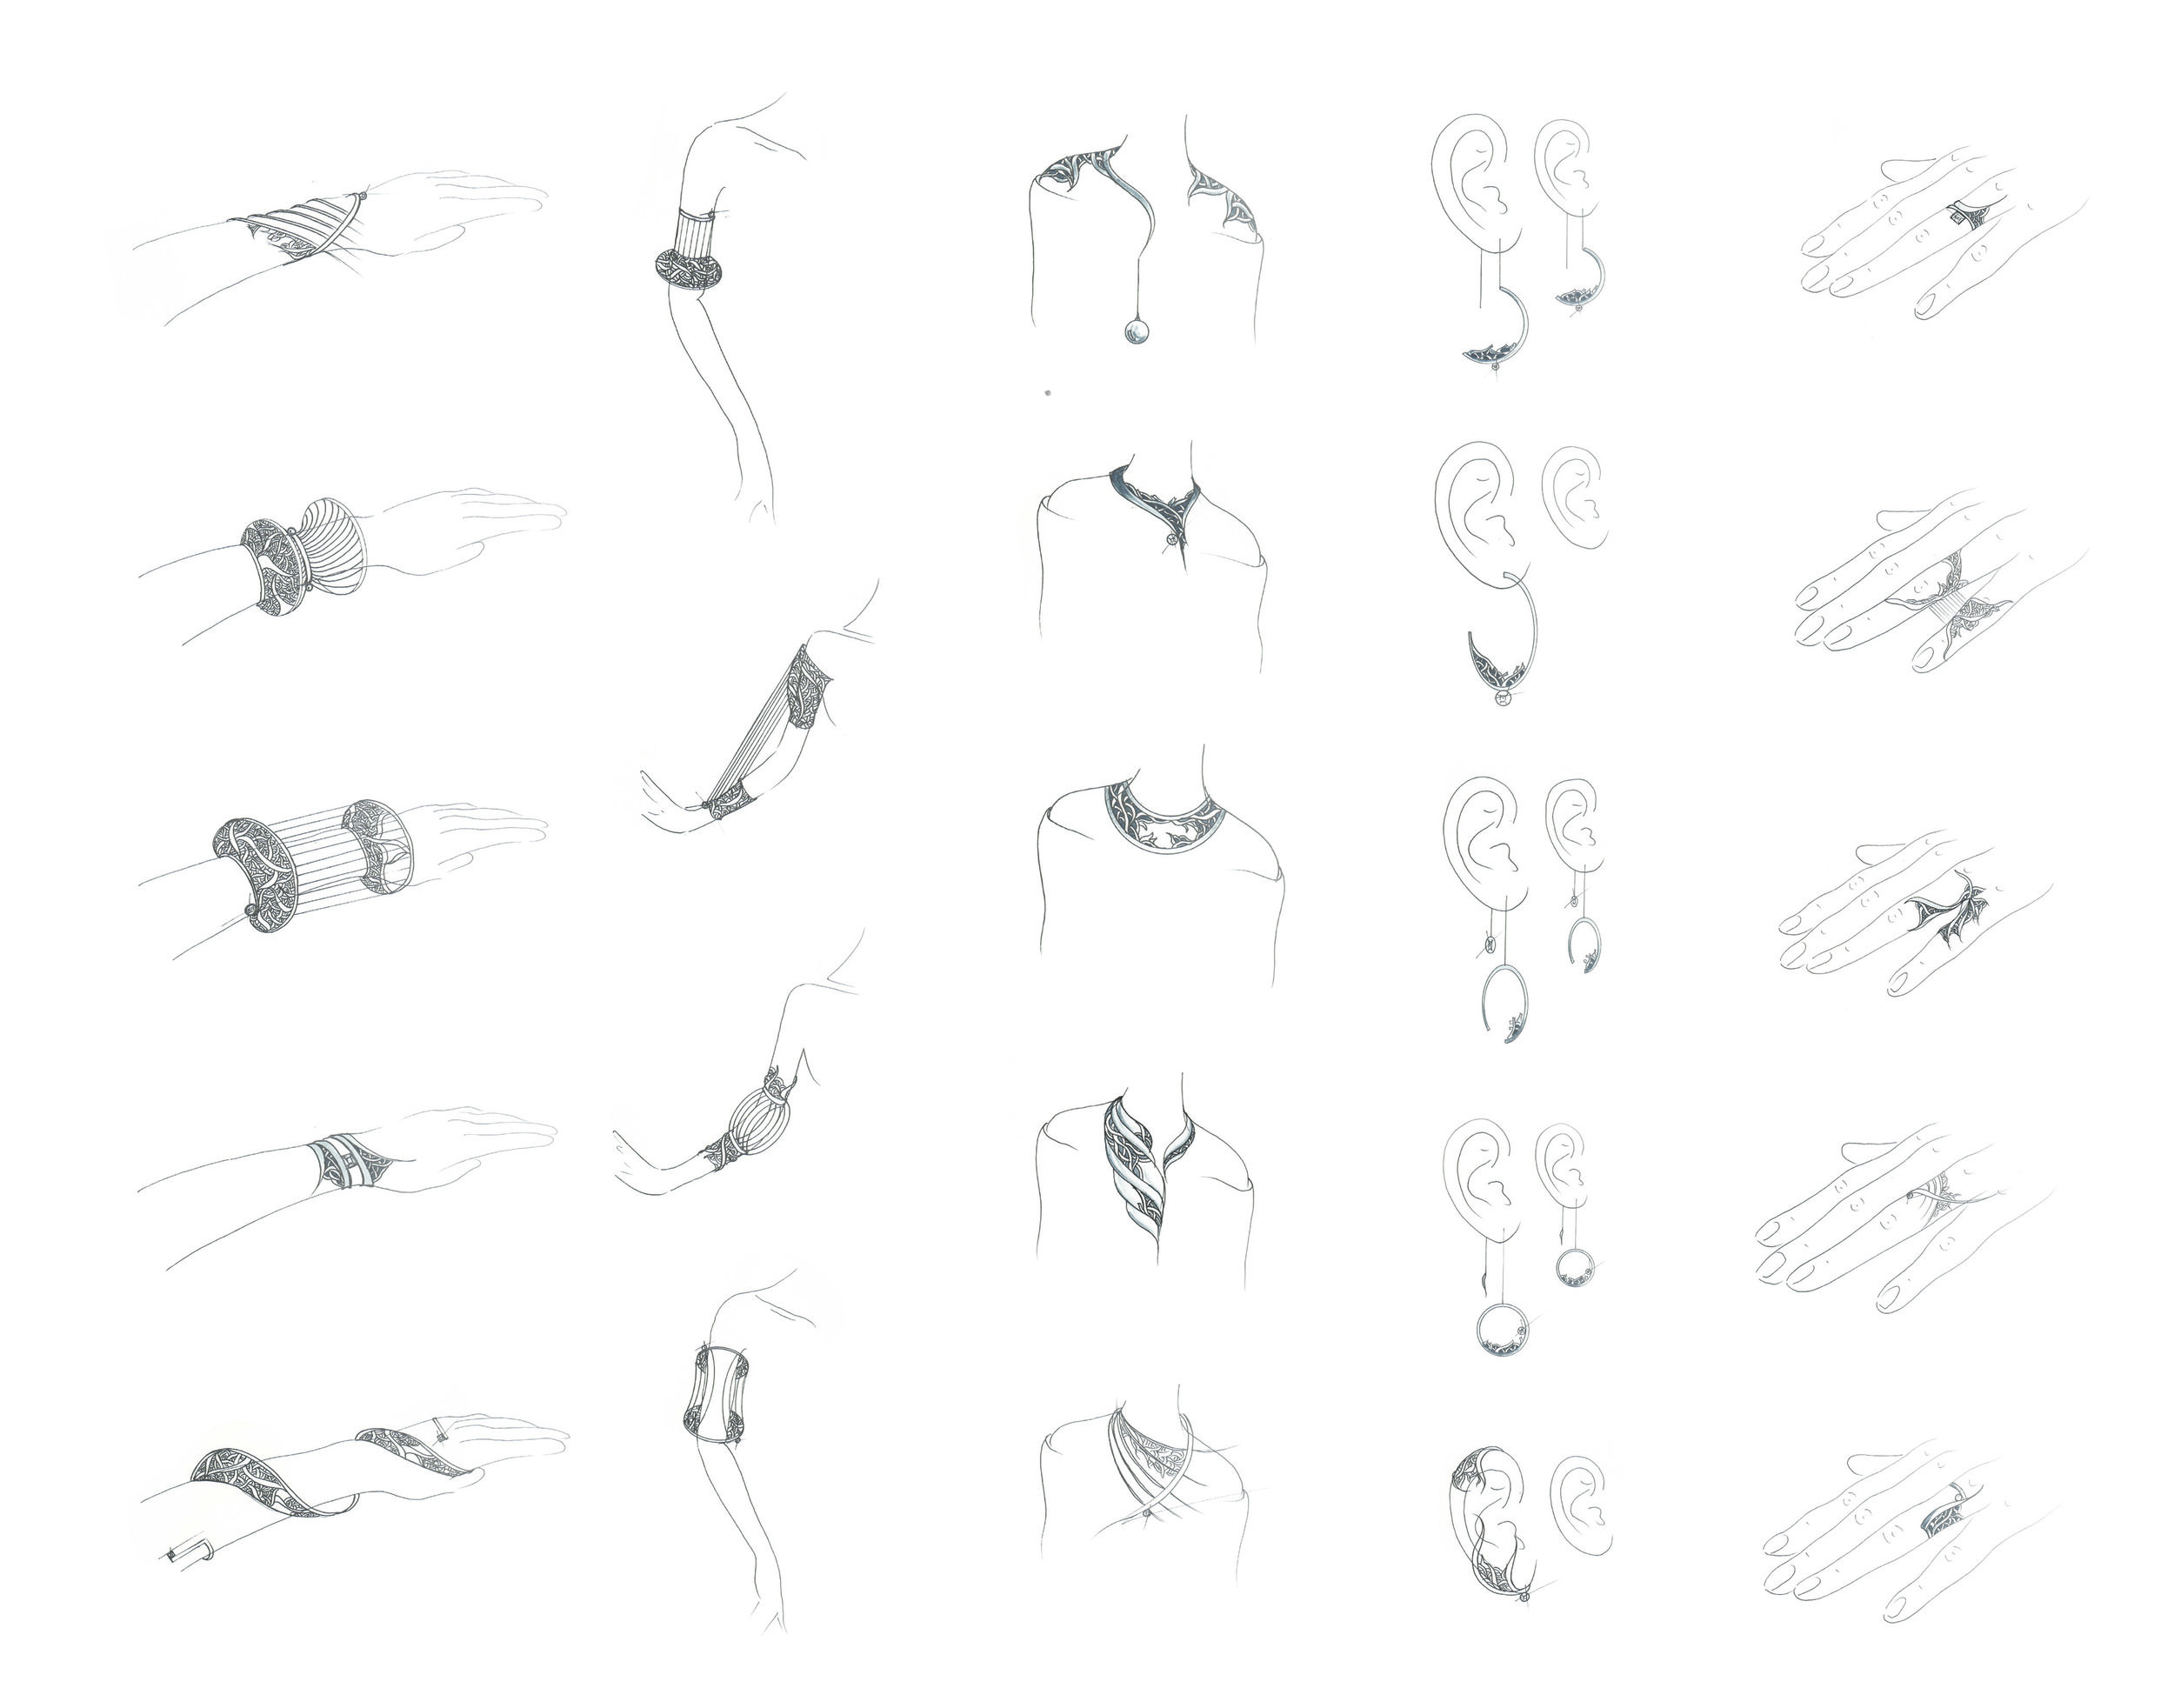 Swanson_Sarah_ Eudemonia Sketches